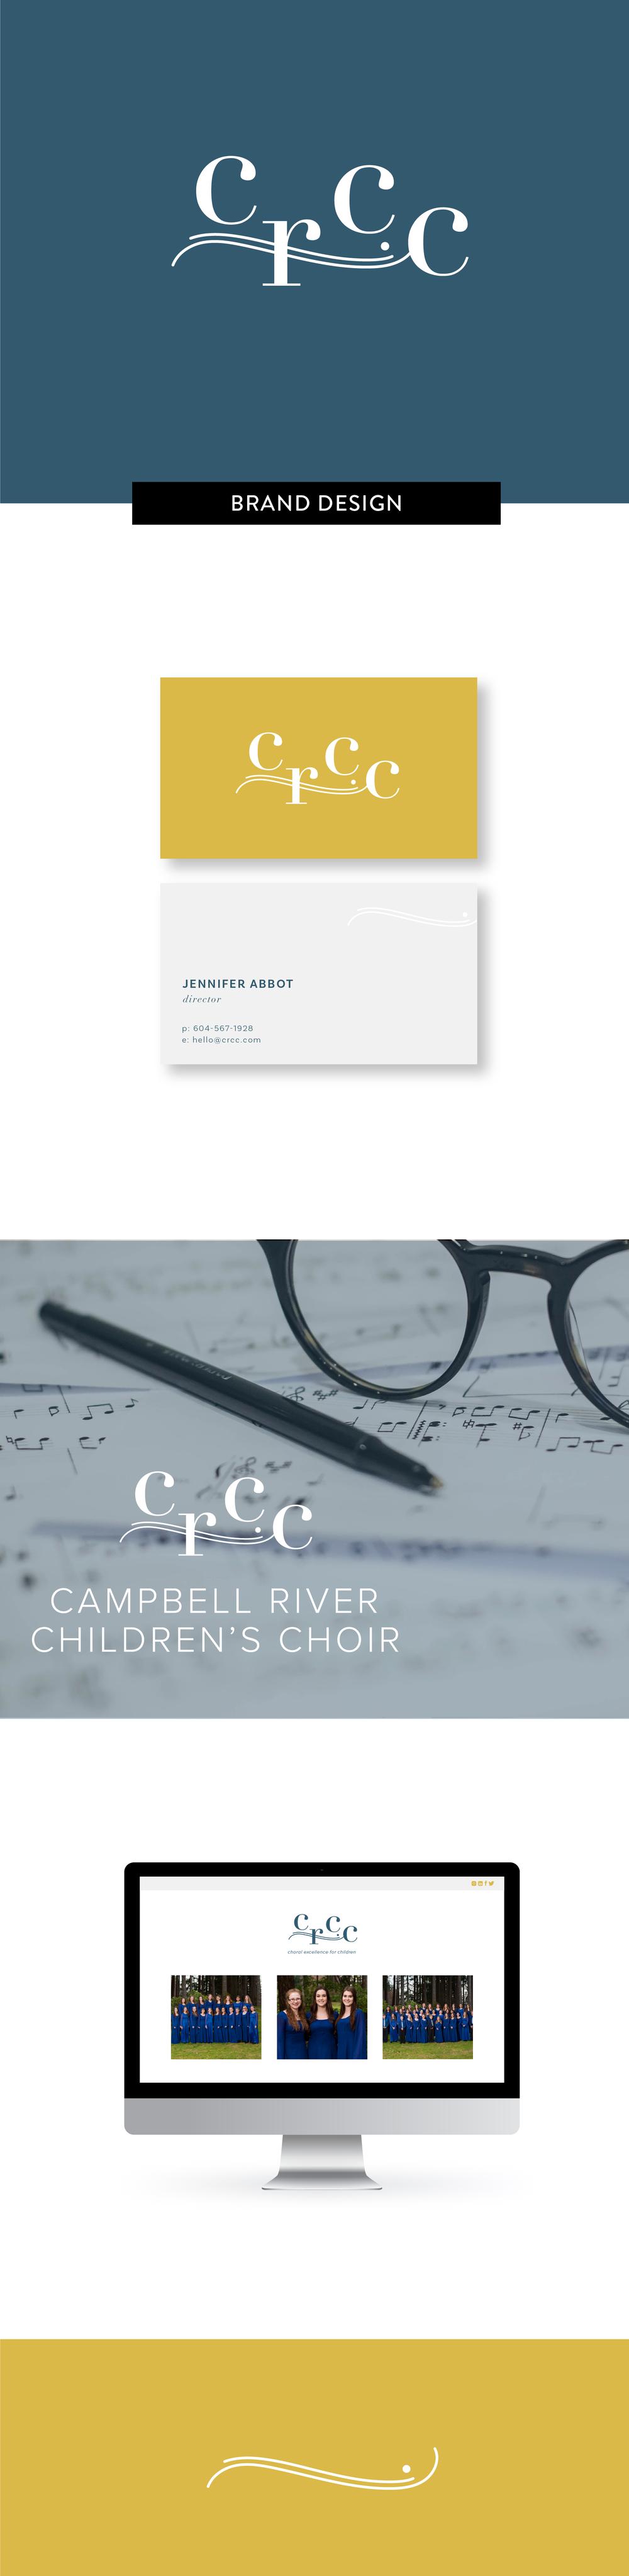 Brand Identity design by Salt Design Co. for Campbell River Children's Choir